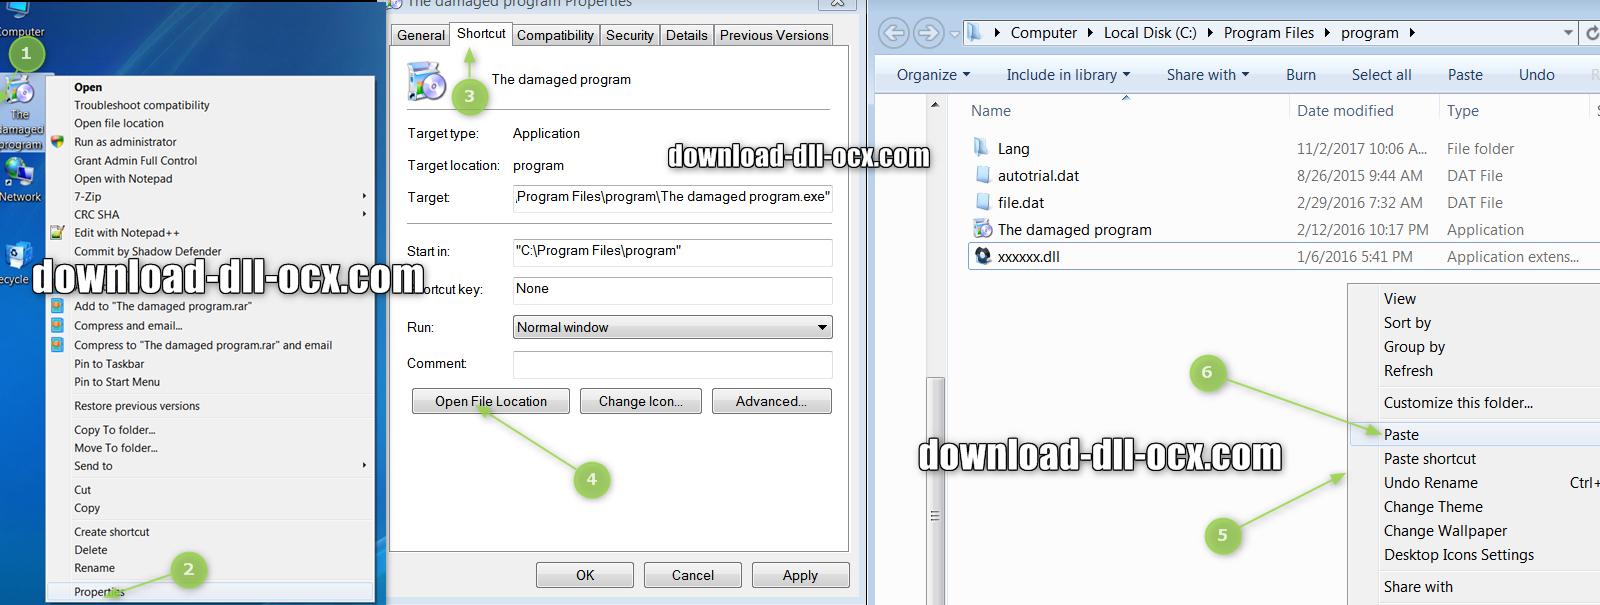 copy the dll file php_xdebug-2.8.0beta2-7.4-vc15-x86_64.dll